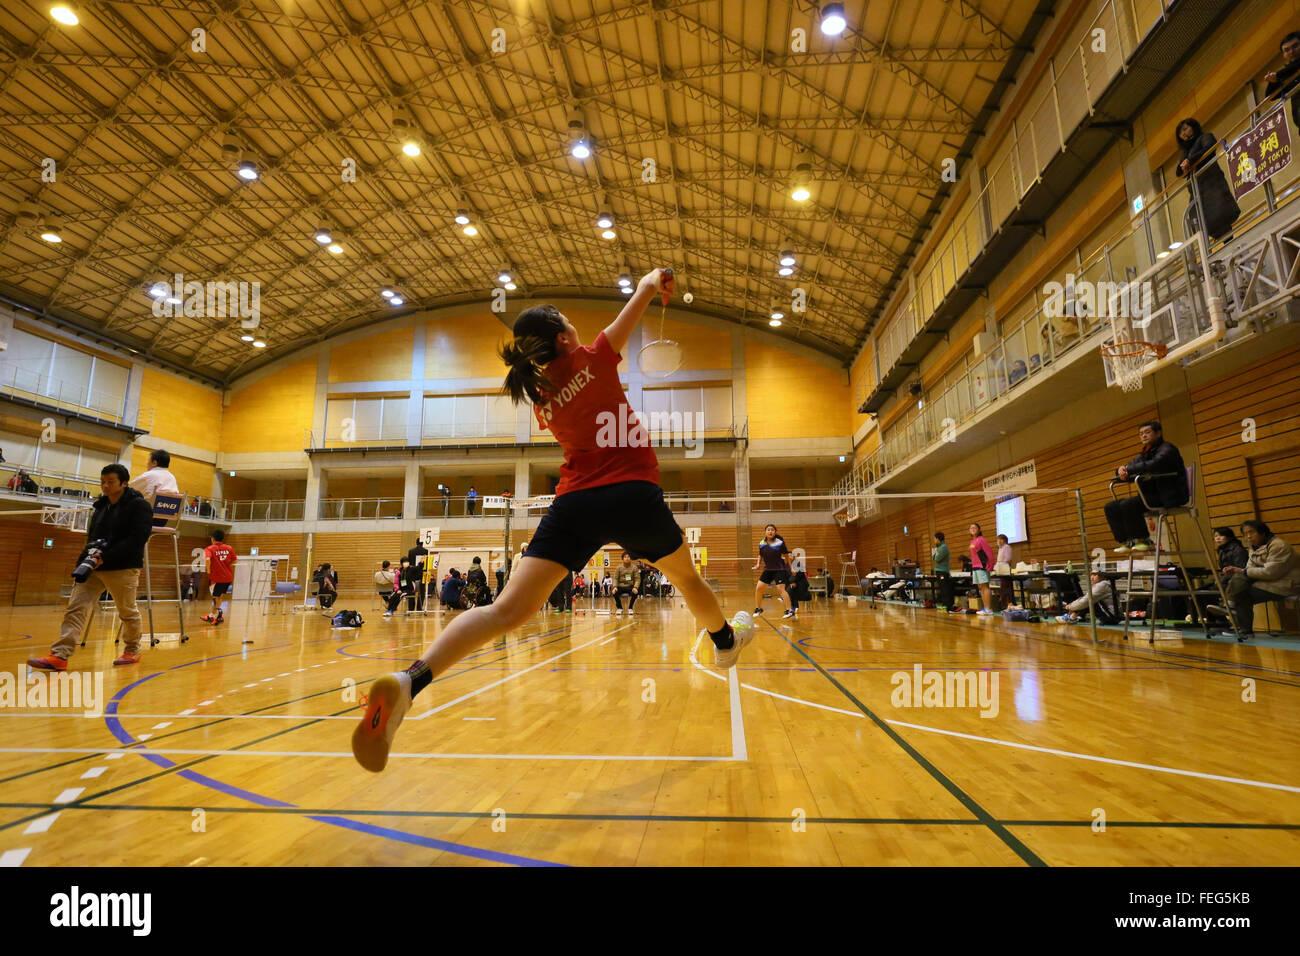 Kurume City western palestra, Fukuoka, Giappone. 6 febbraio, 2016. Mamiko Toyoda, 6 febbraio 2016 - Badminton : Immagini Stock